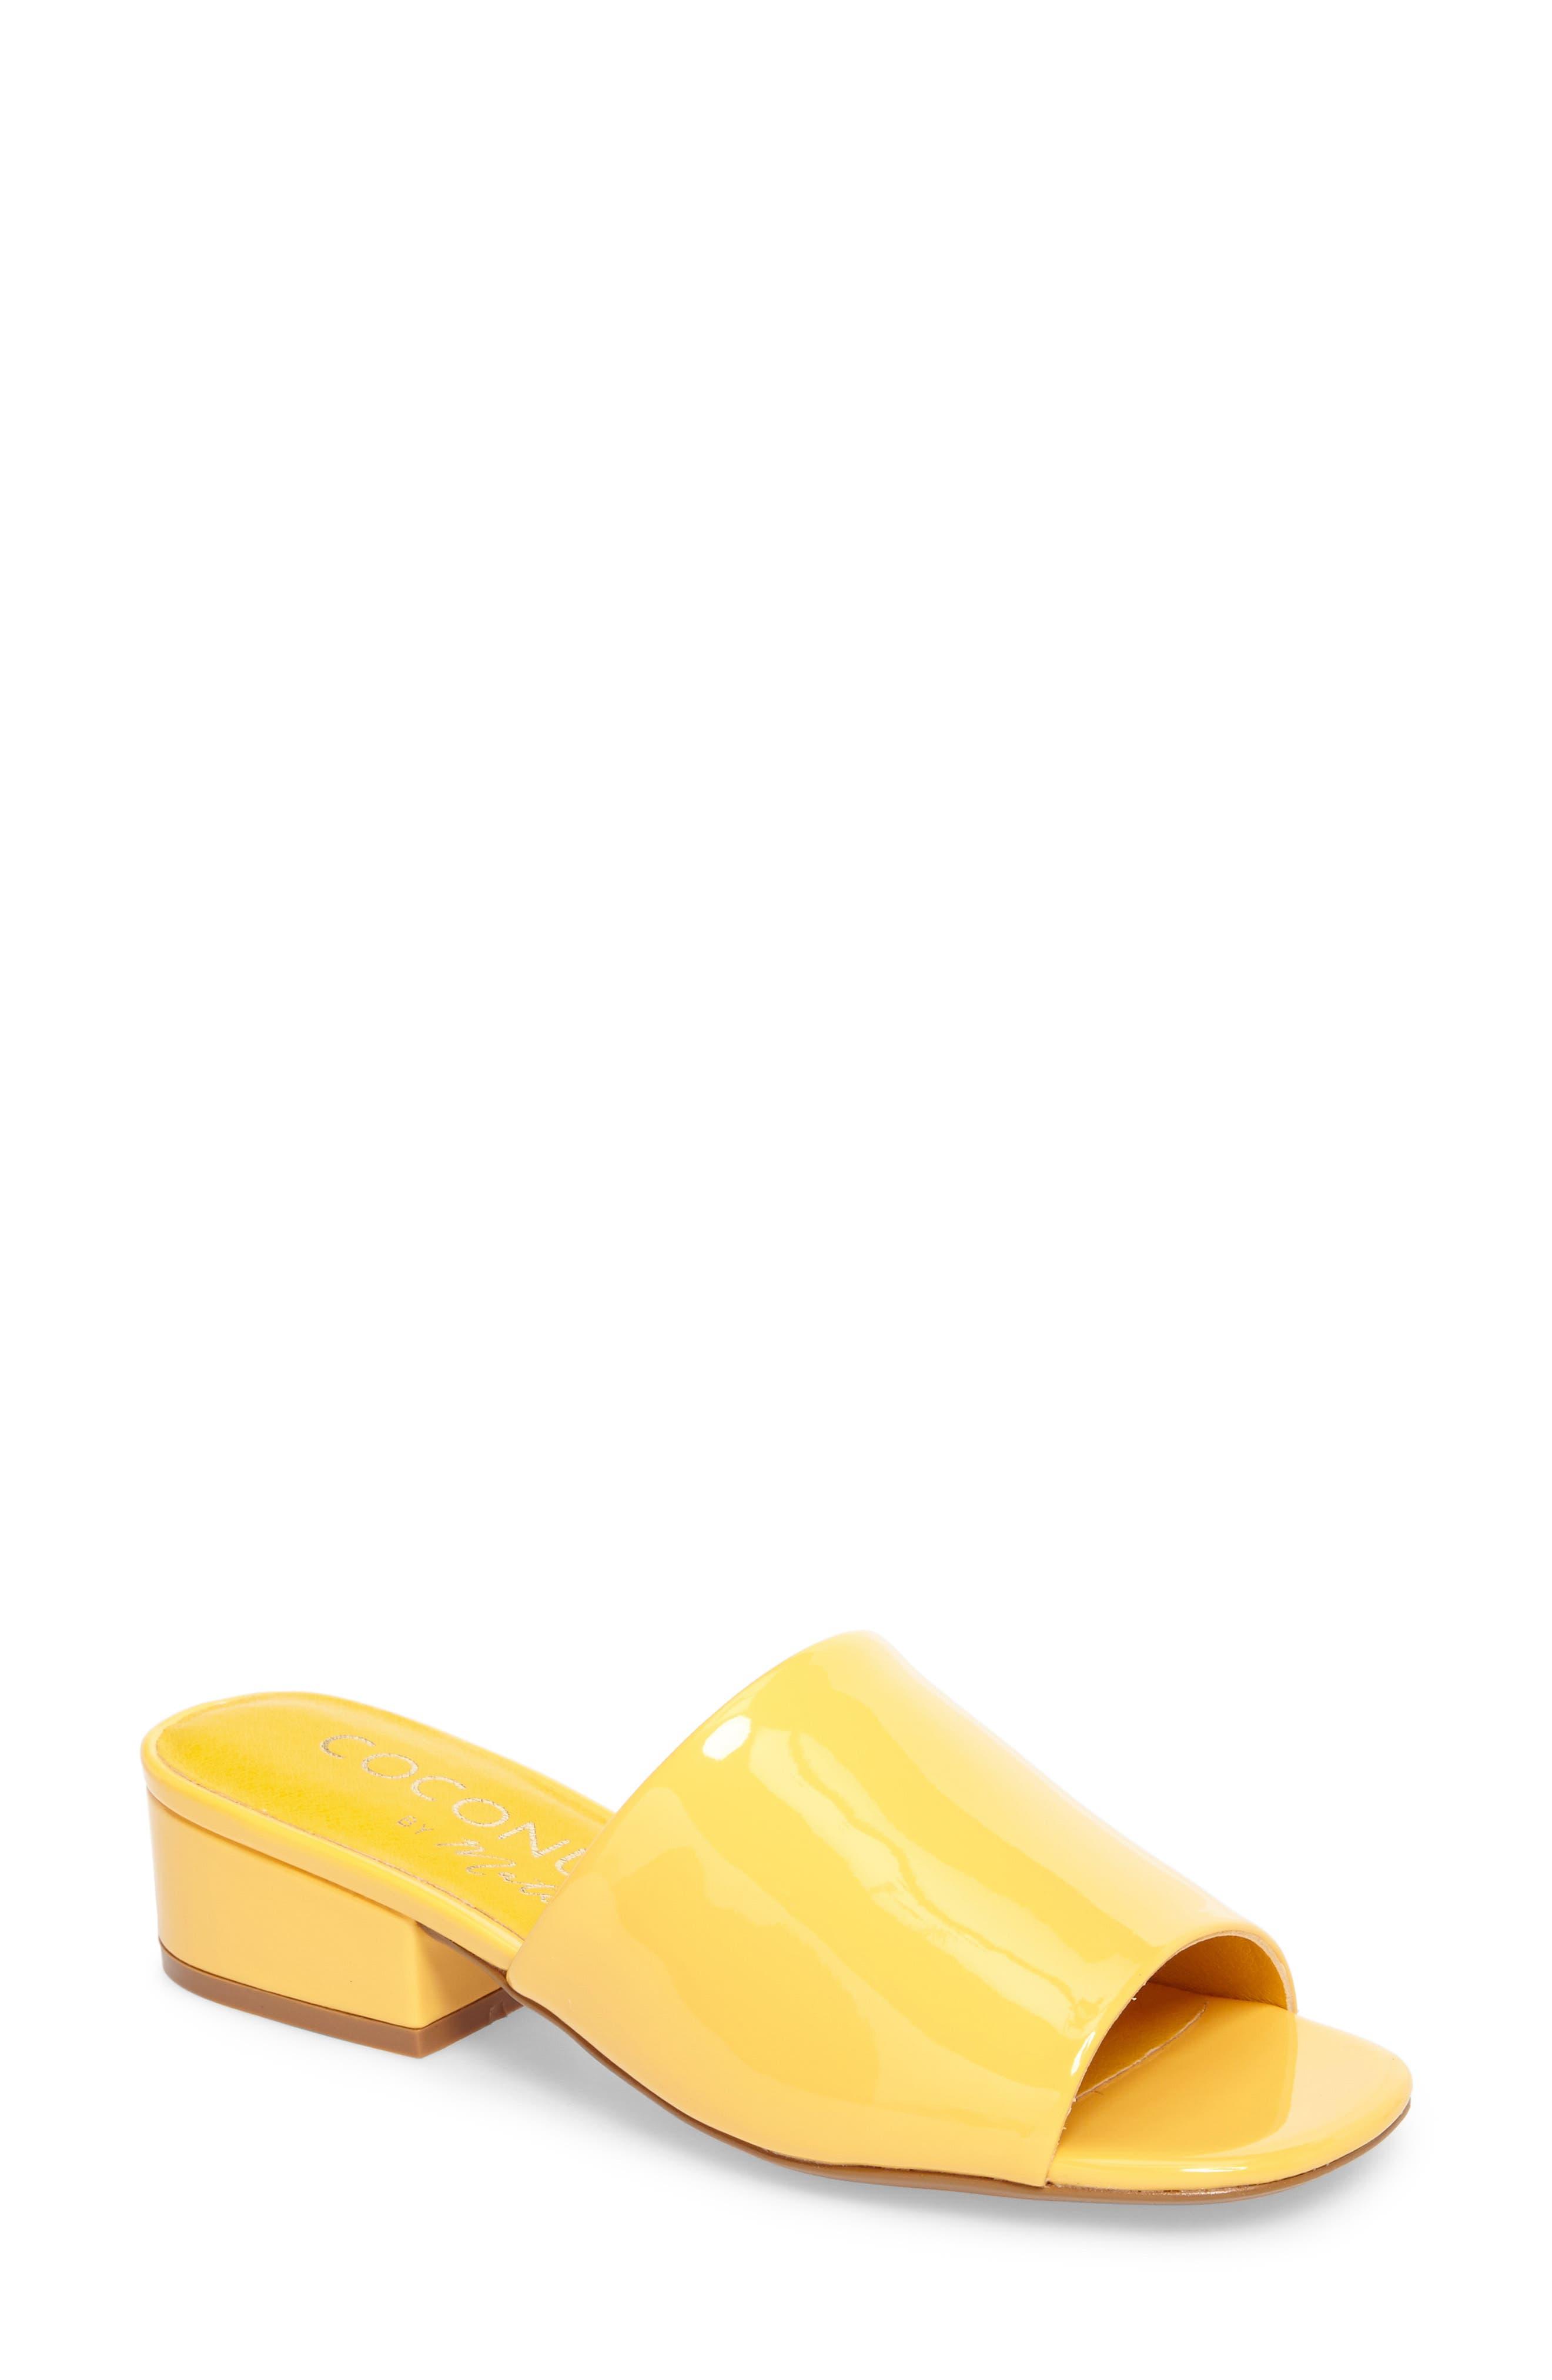 Plantain Slide Sandal,                         Main,                         color, Mango